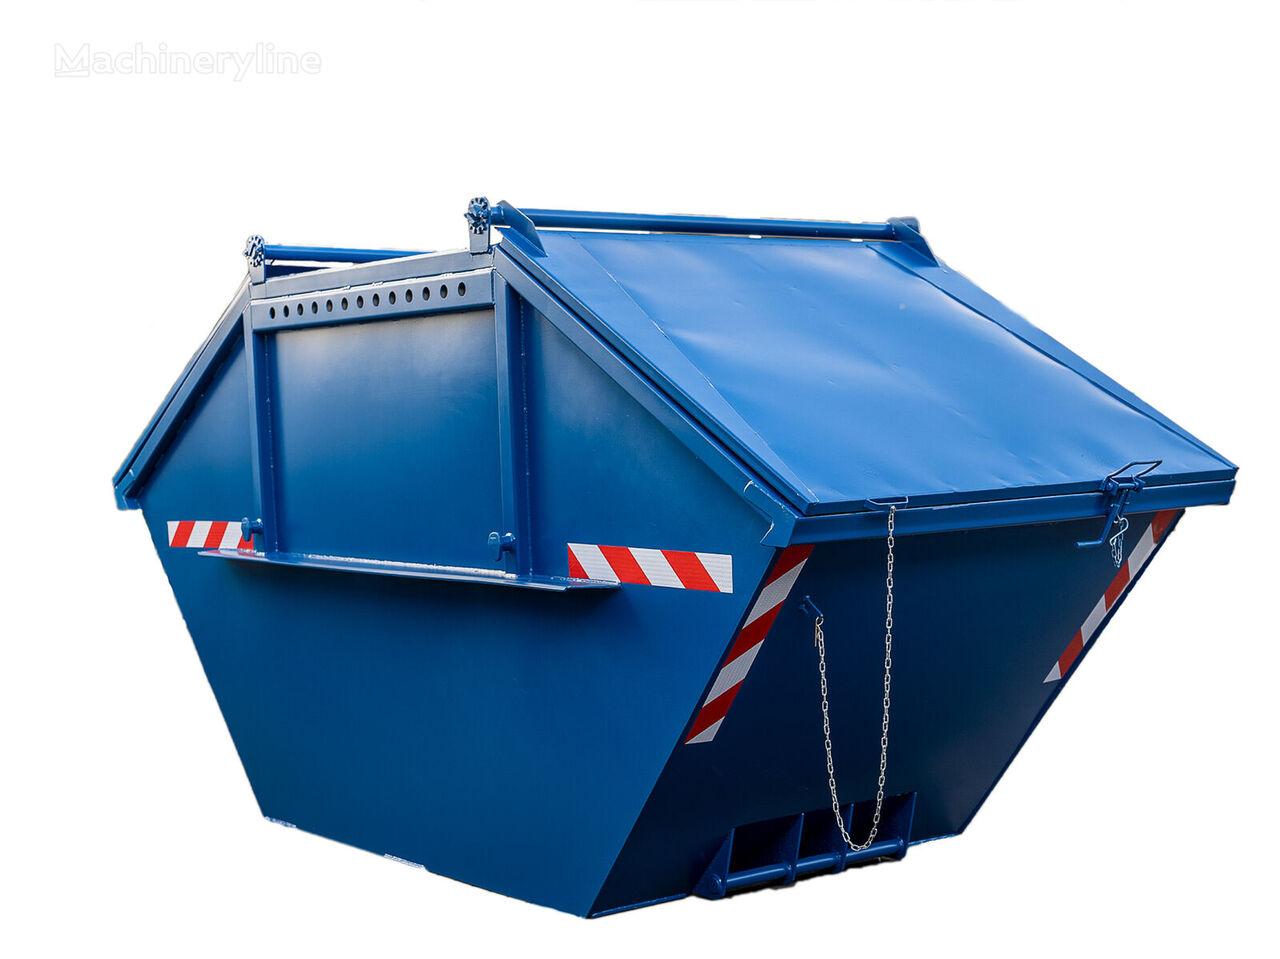 Absetzmulde Absetzcontainer Mulde Container 10cbm Stahldeckel contenedor de obra nuevo